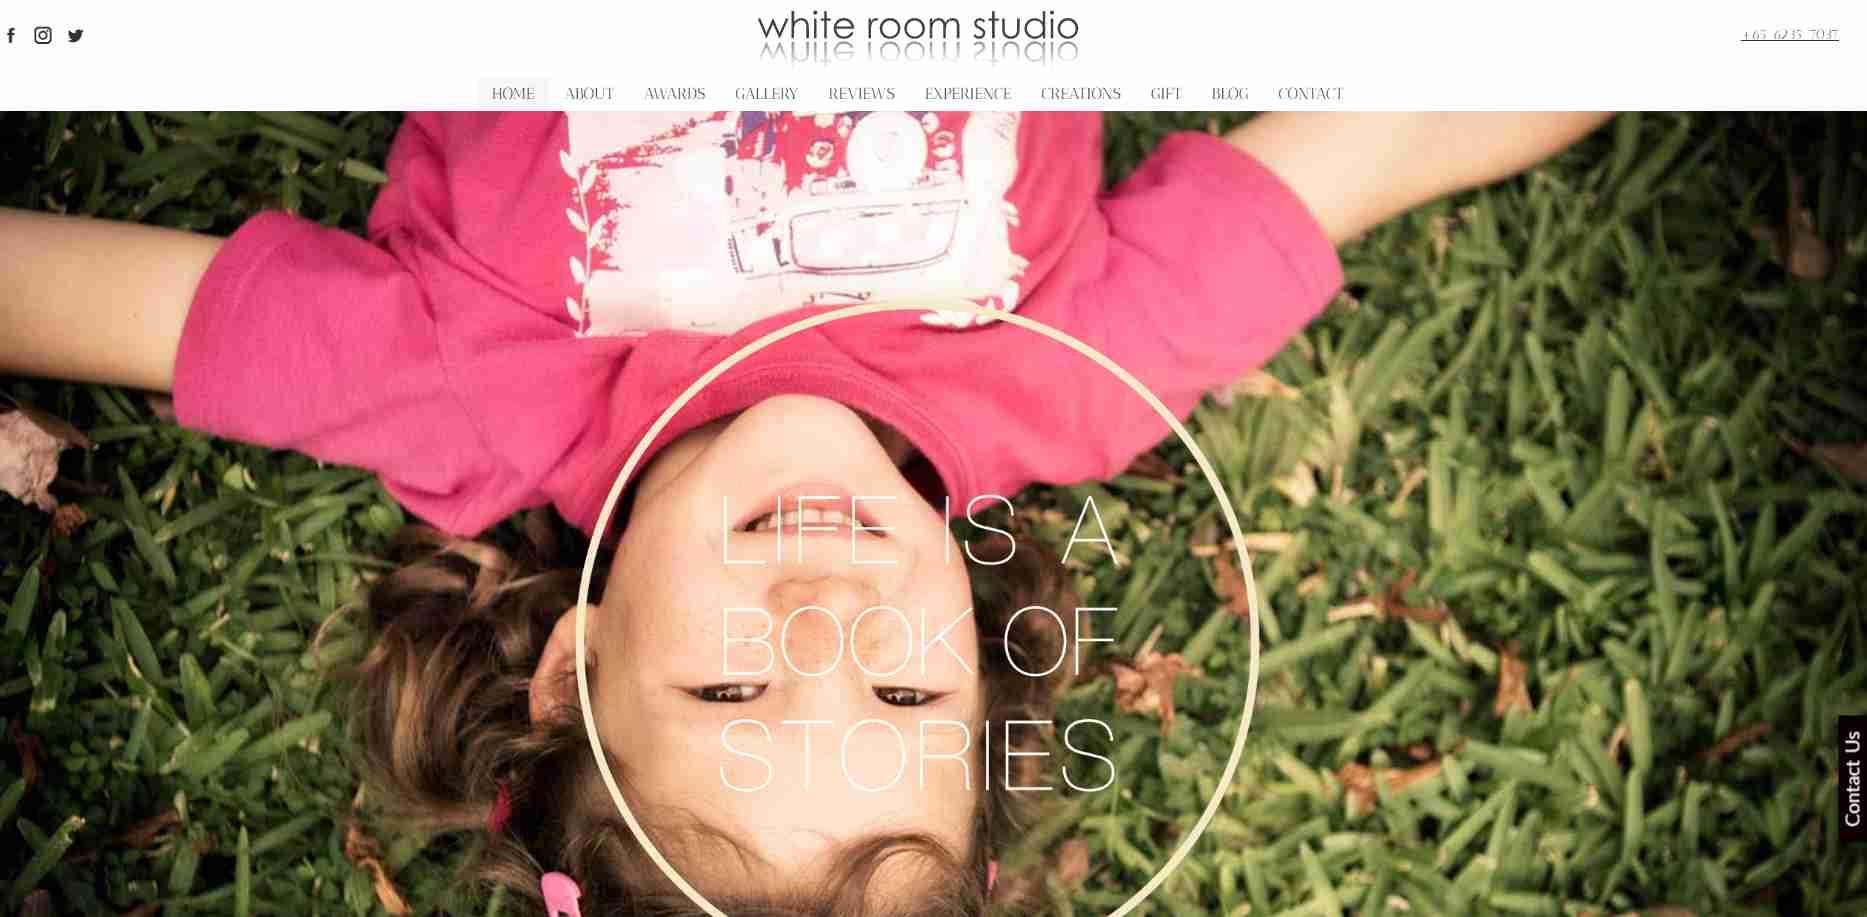 white room studios Top Portrait Photography Studios in Singapore